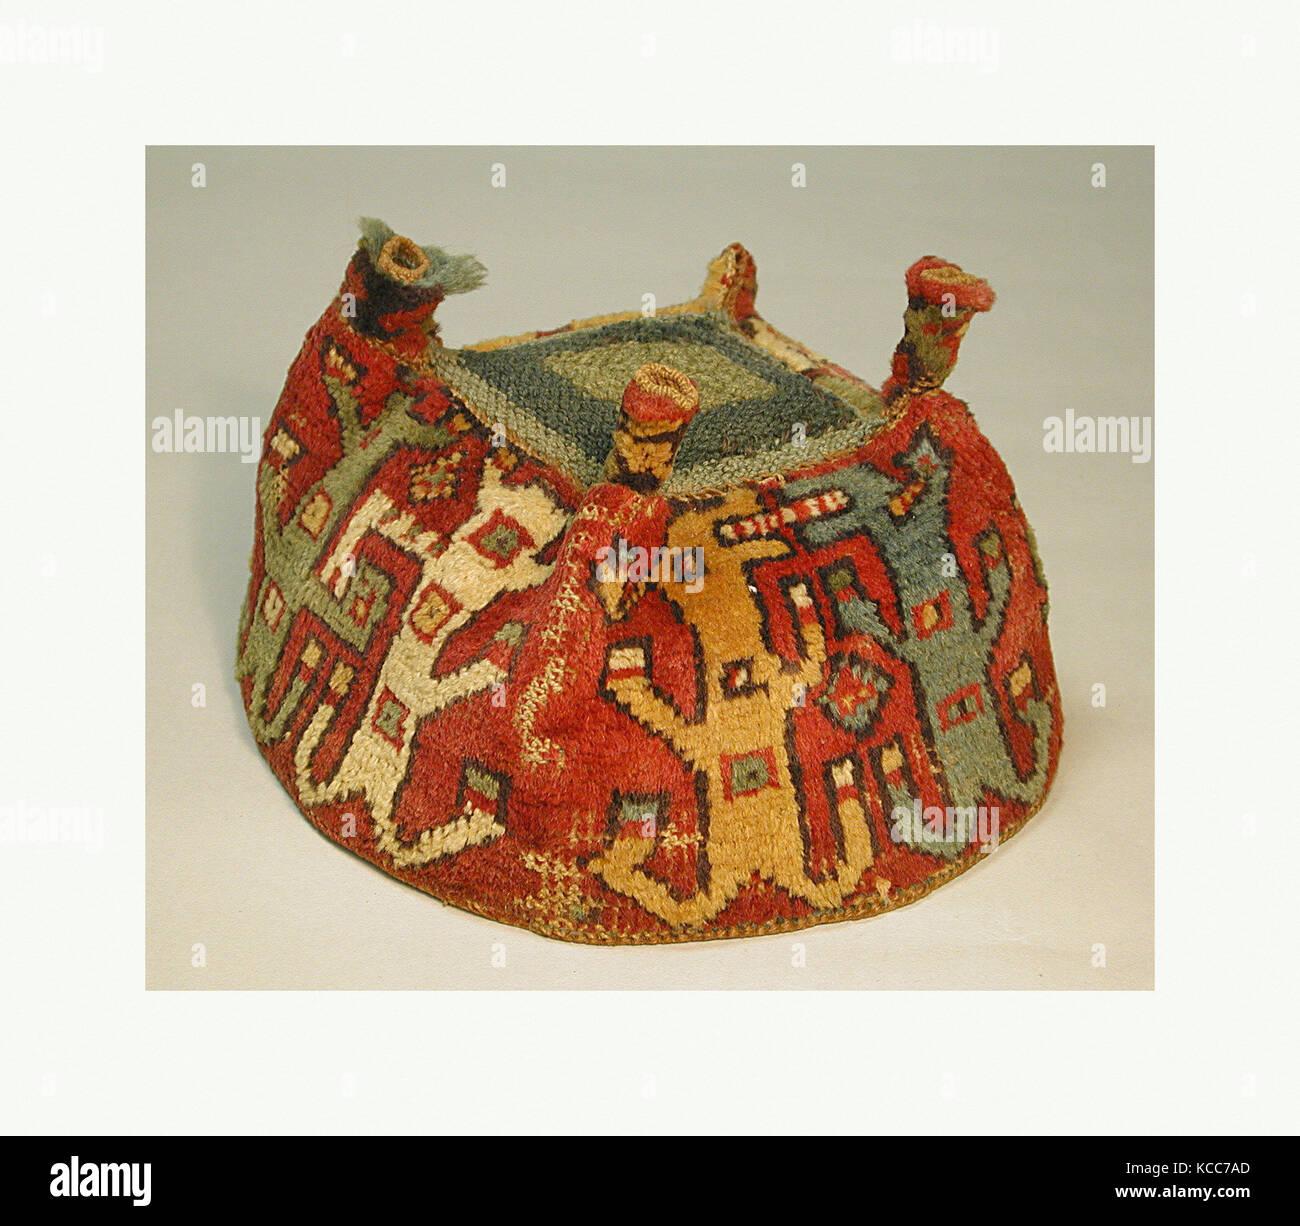 Four-Cornered Hat, 7th–9th century, Peru, Wari, Camelid hair, H x W: 4 3/4 x 7 1/4in. (12.1 x 18.4cm), Textiles - Stock Image